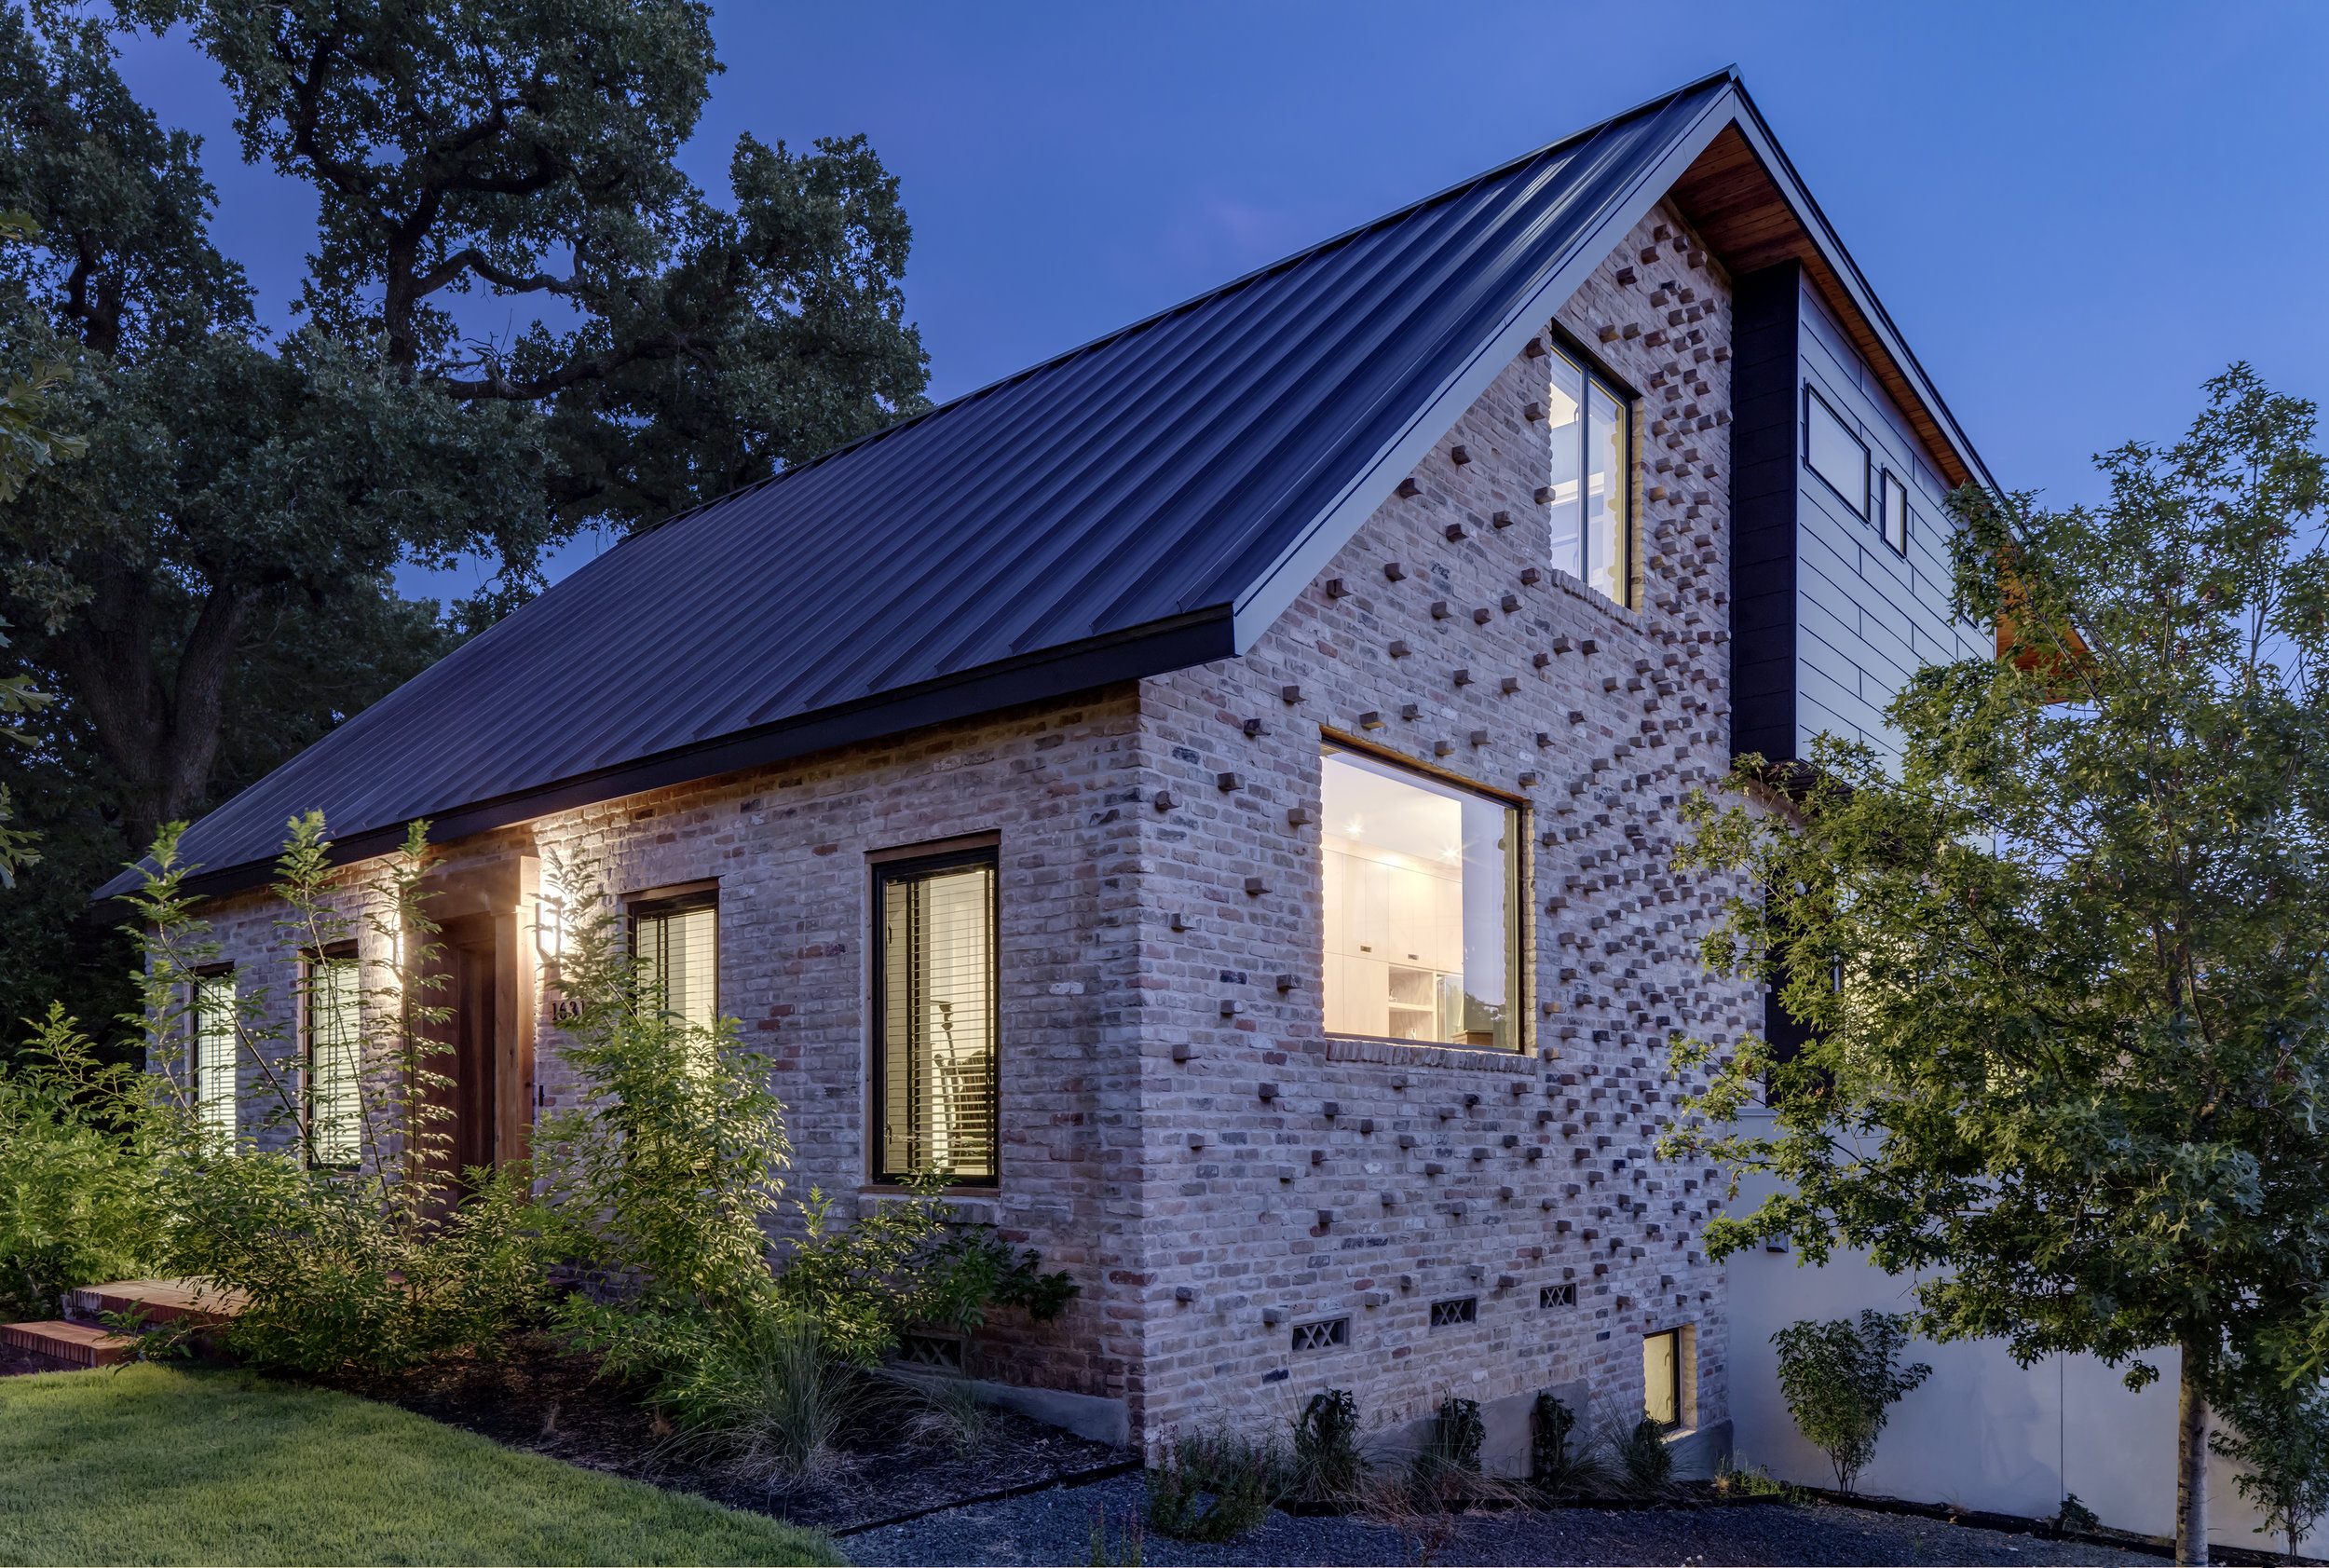 17 Mullet House by Matt Fajkus Architecture. Photo by Charles Davis Smith.jpg